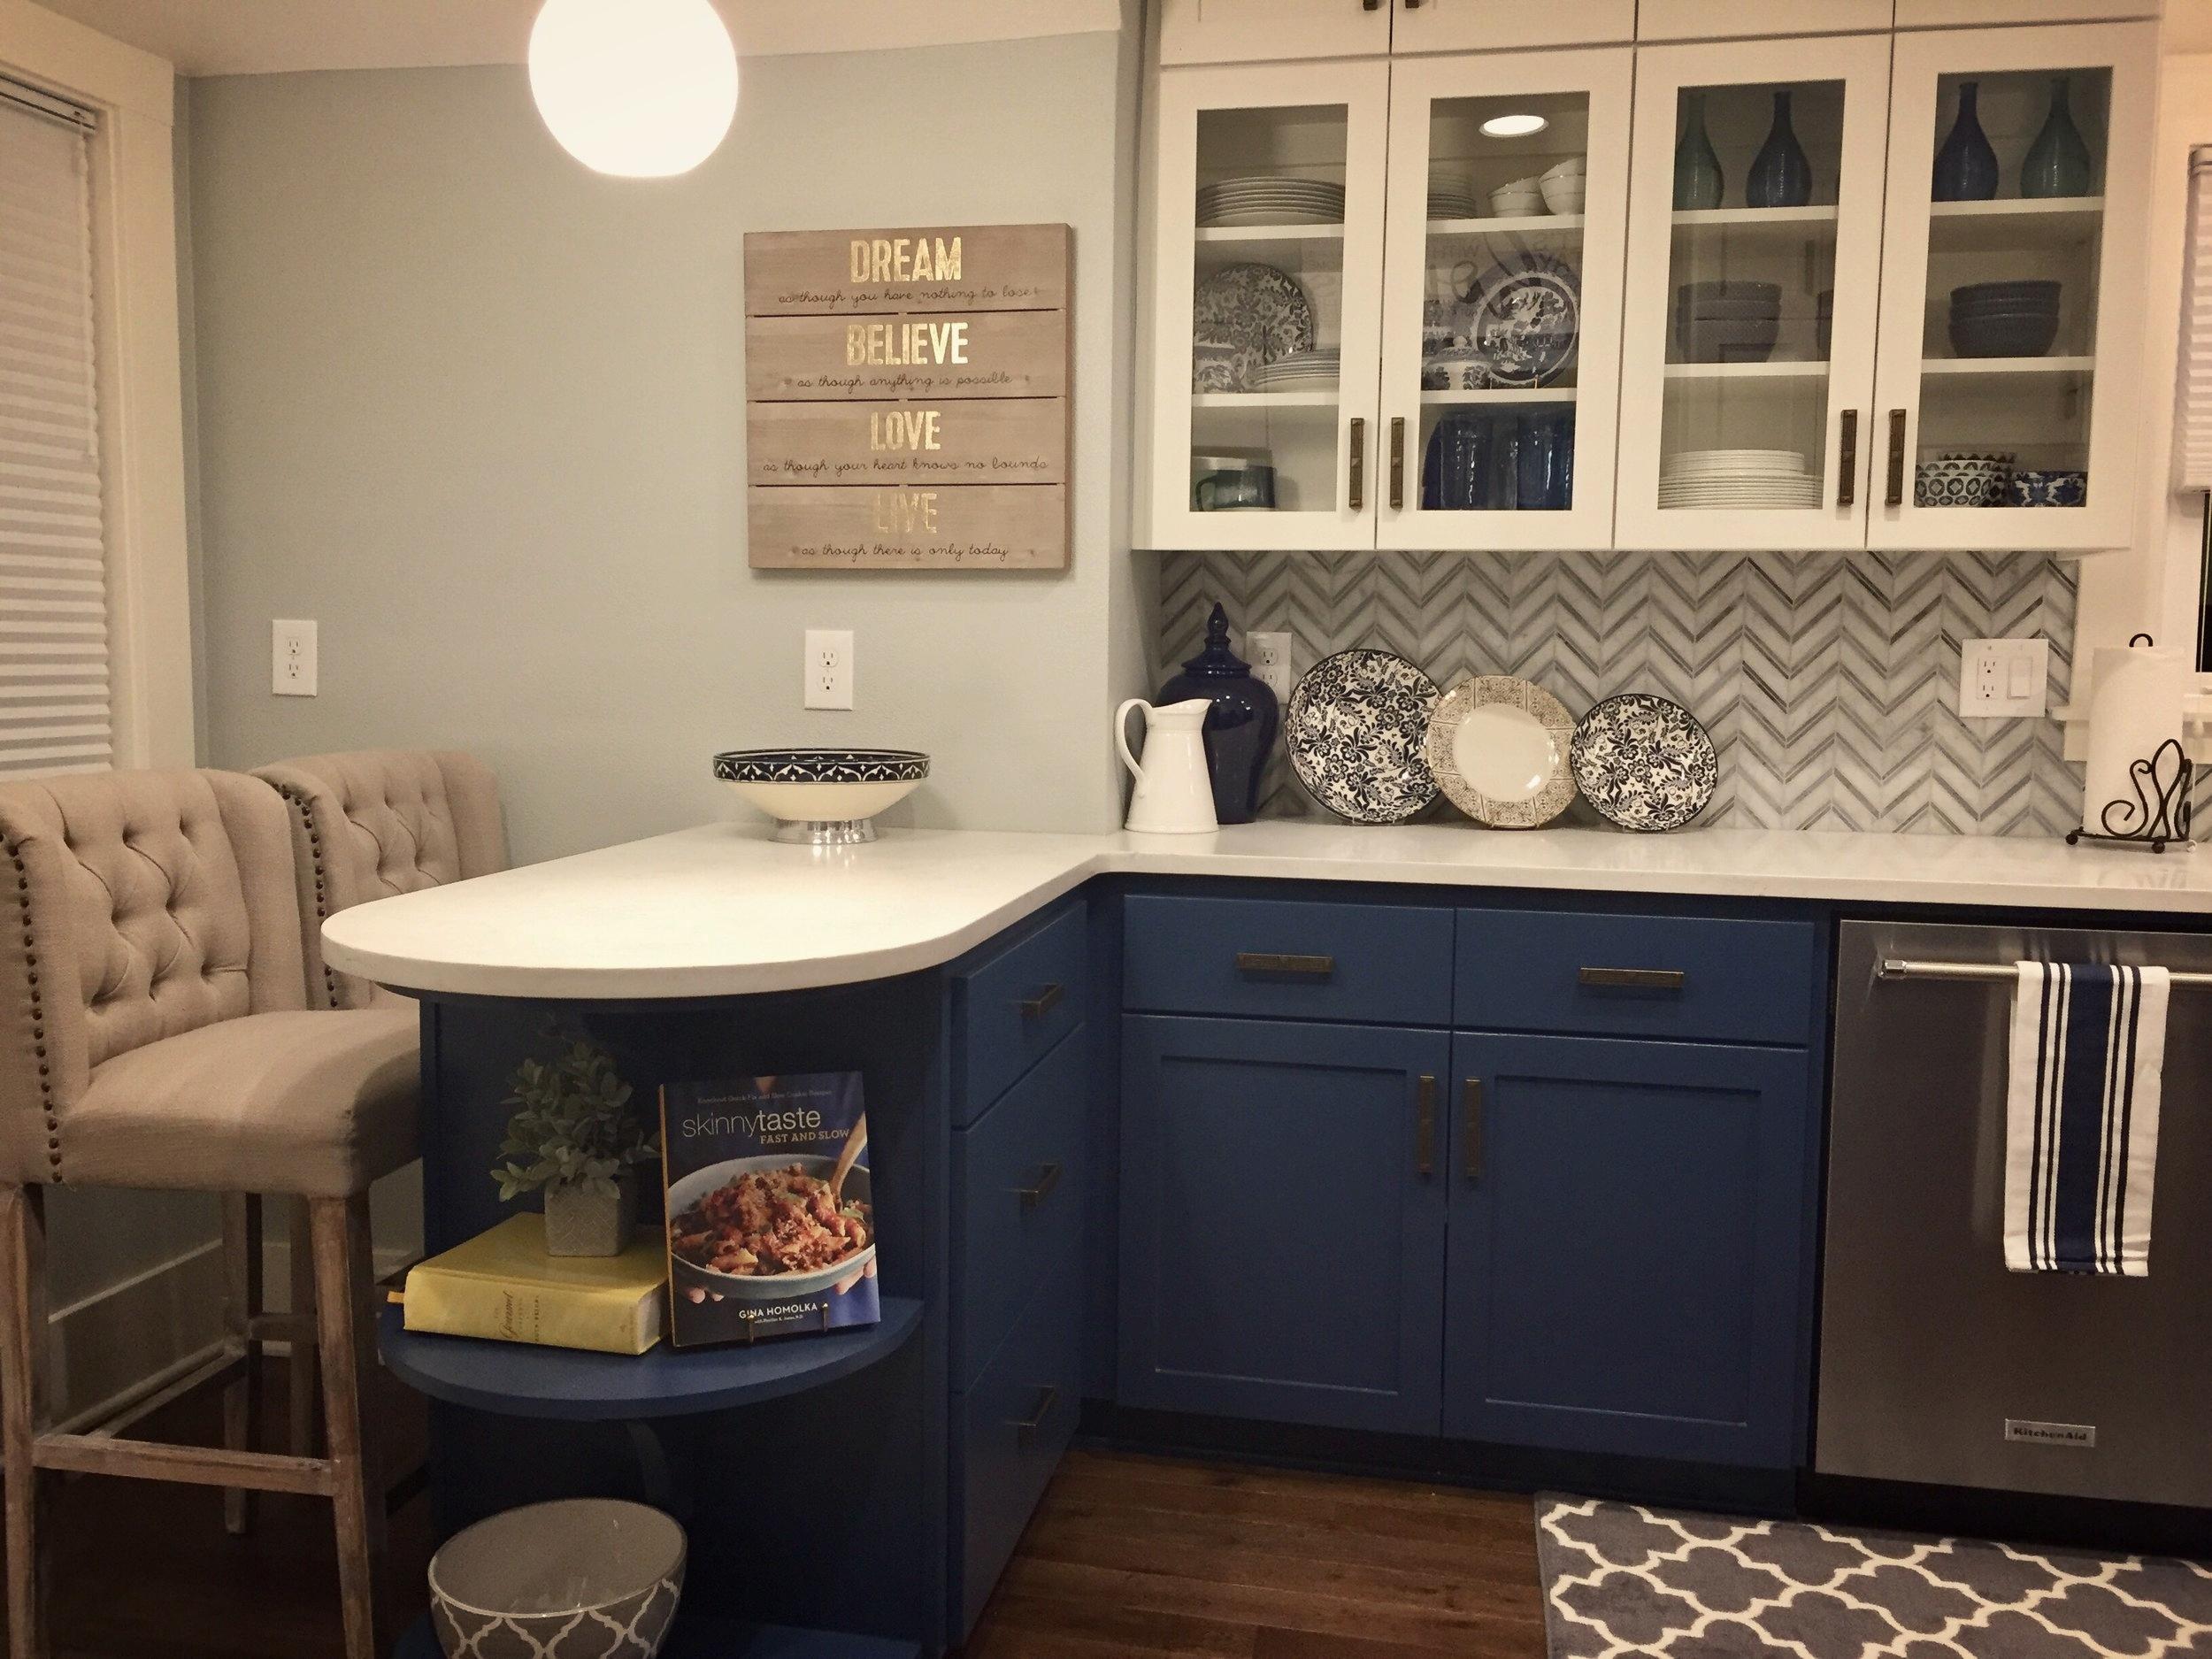 Batista Residence Kitchen 2.jpeg